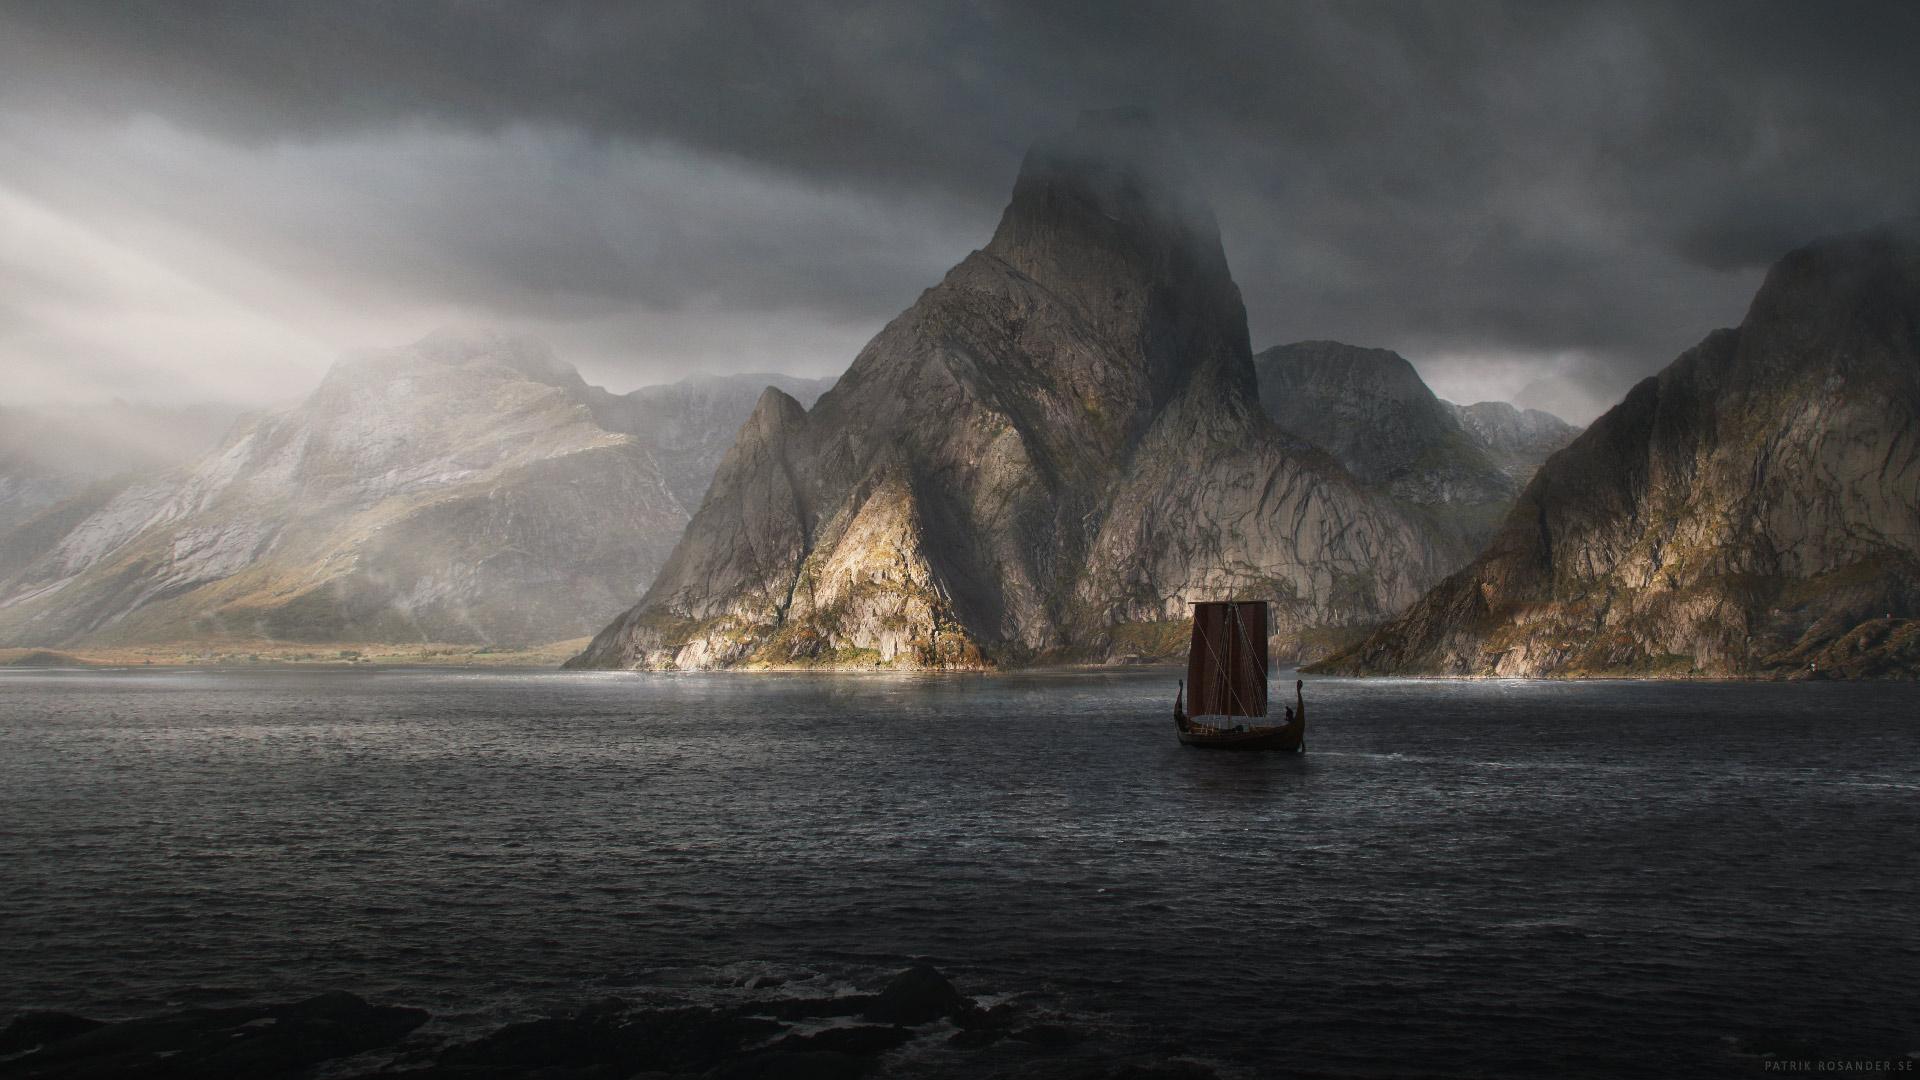 1459-the-last-vikings-patrik-rosander